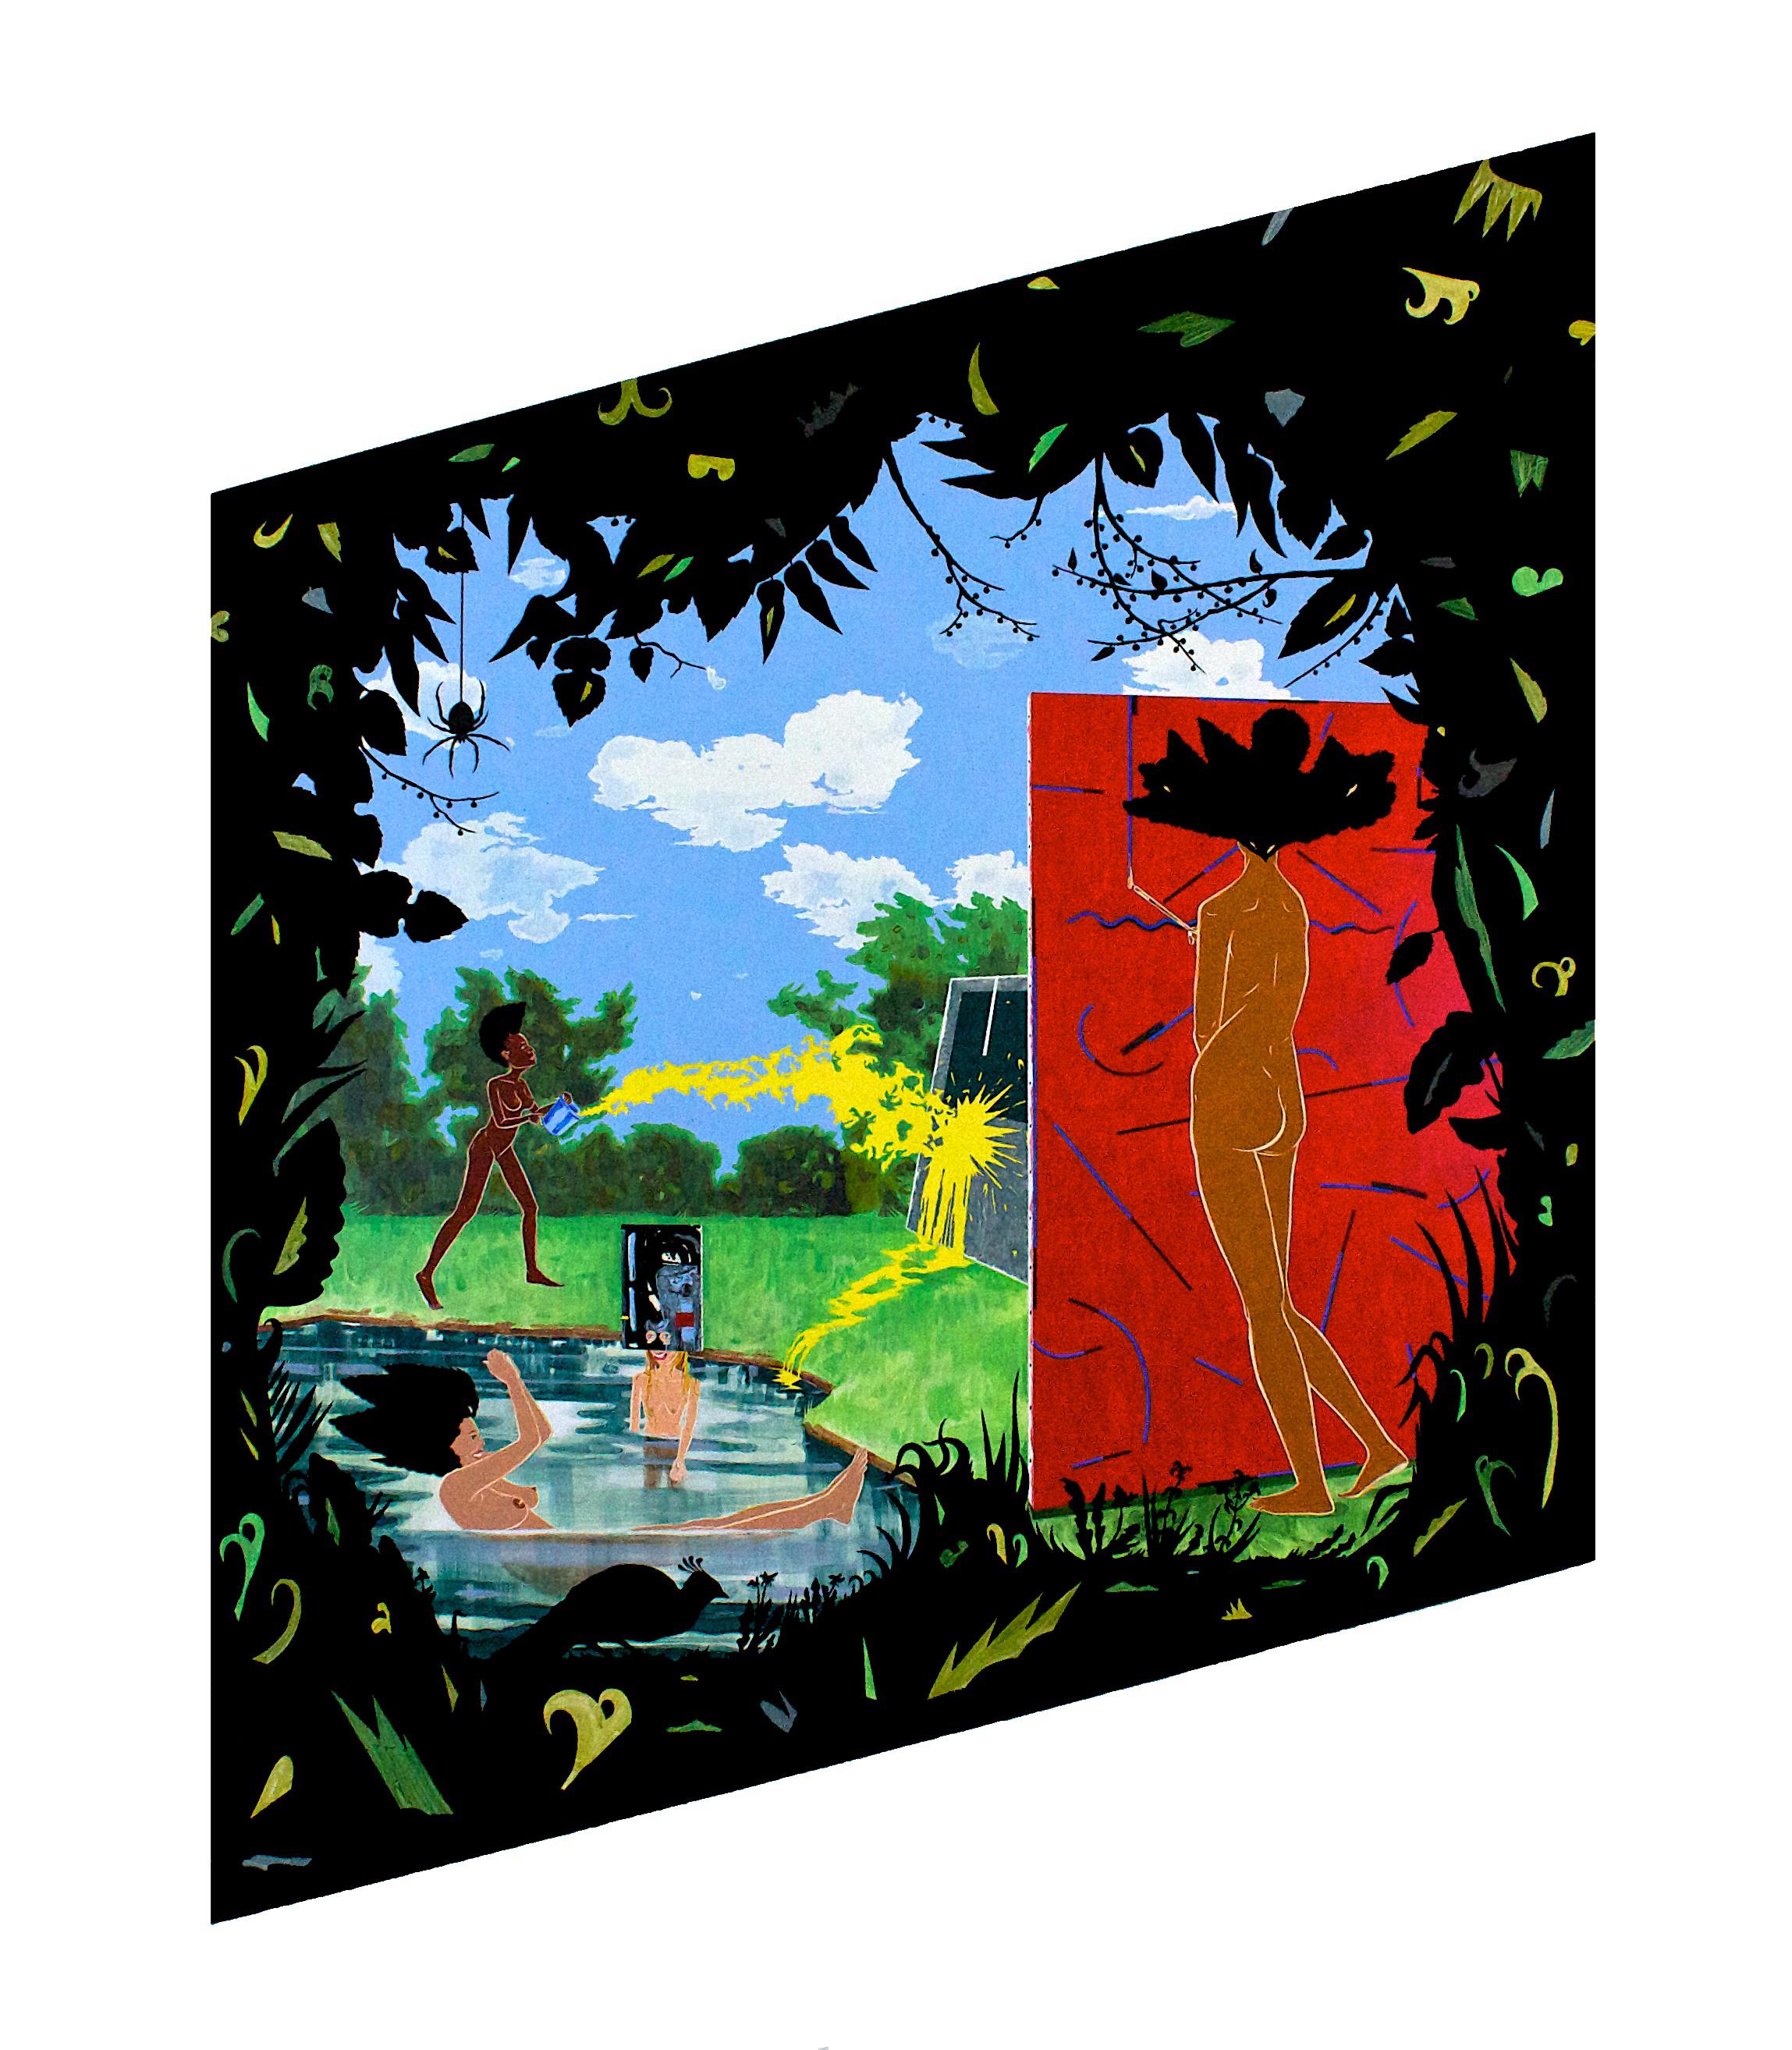 Rhombus - acrylic, paper, and velvet flocking on wood panel75 x 58 x 2 in.